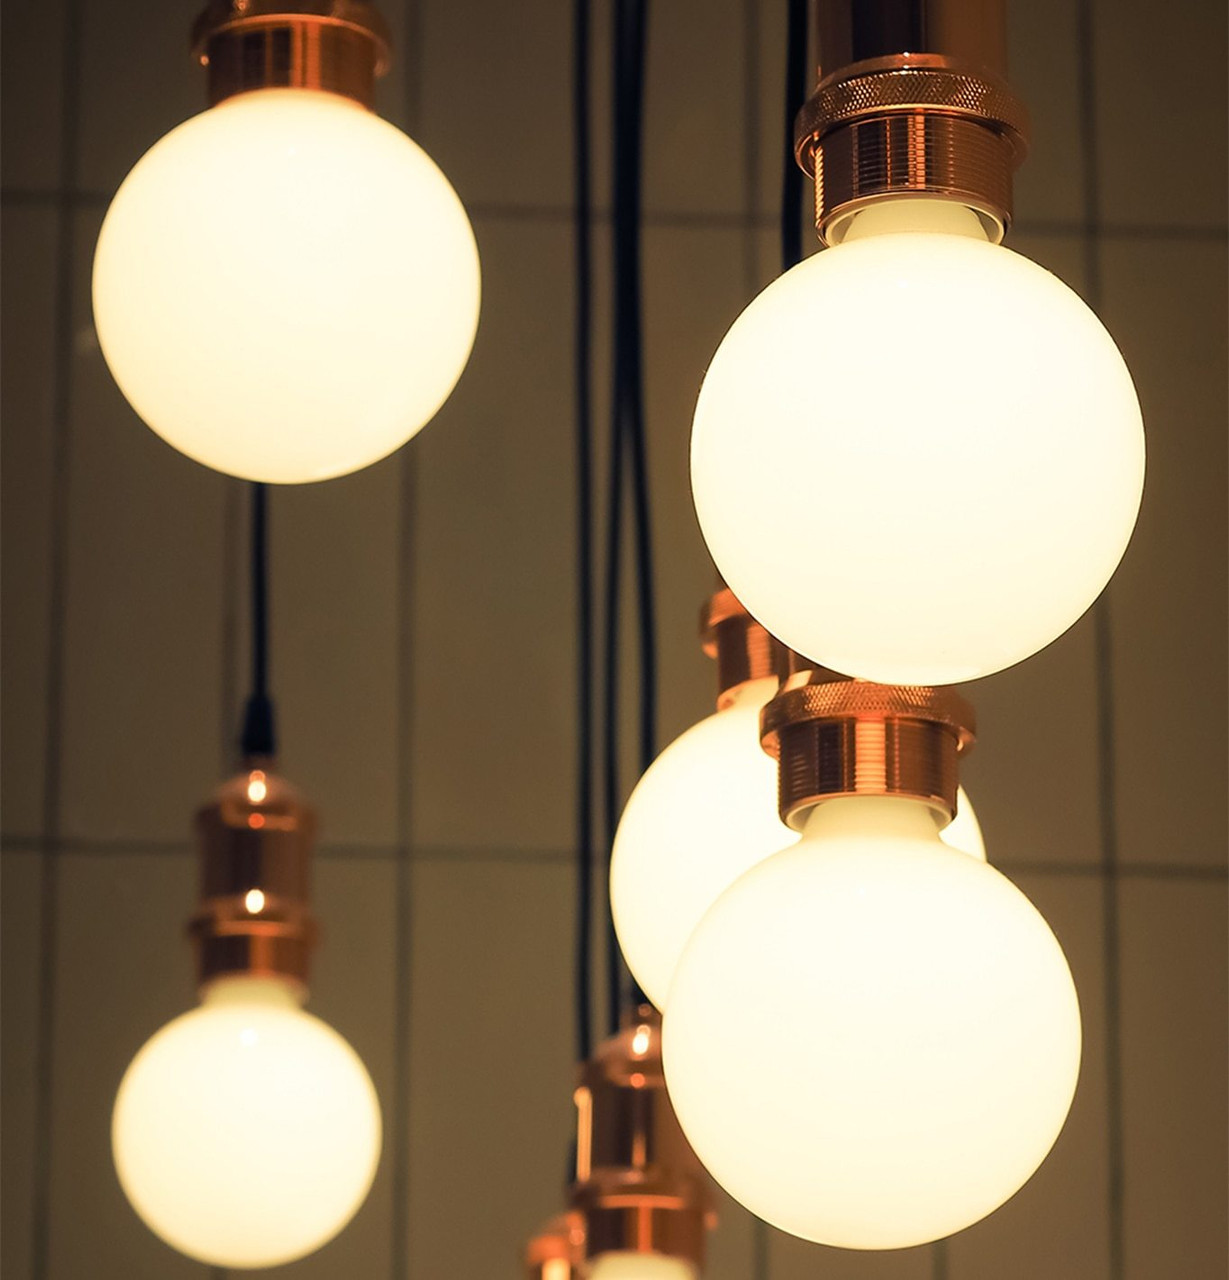 Crompton Lamps LED G95 Bayonet Light Bulbs